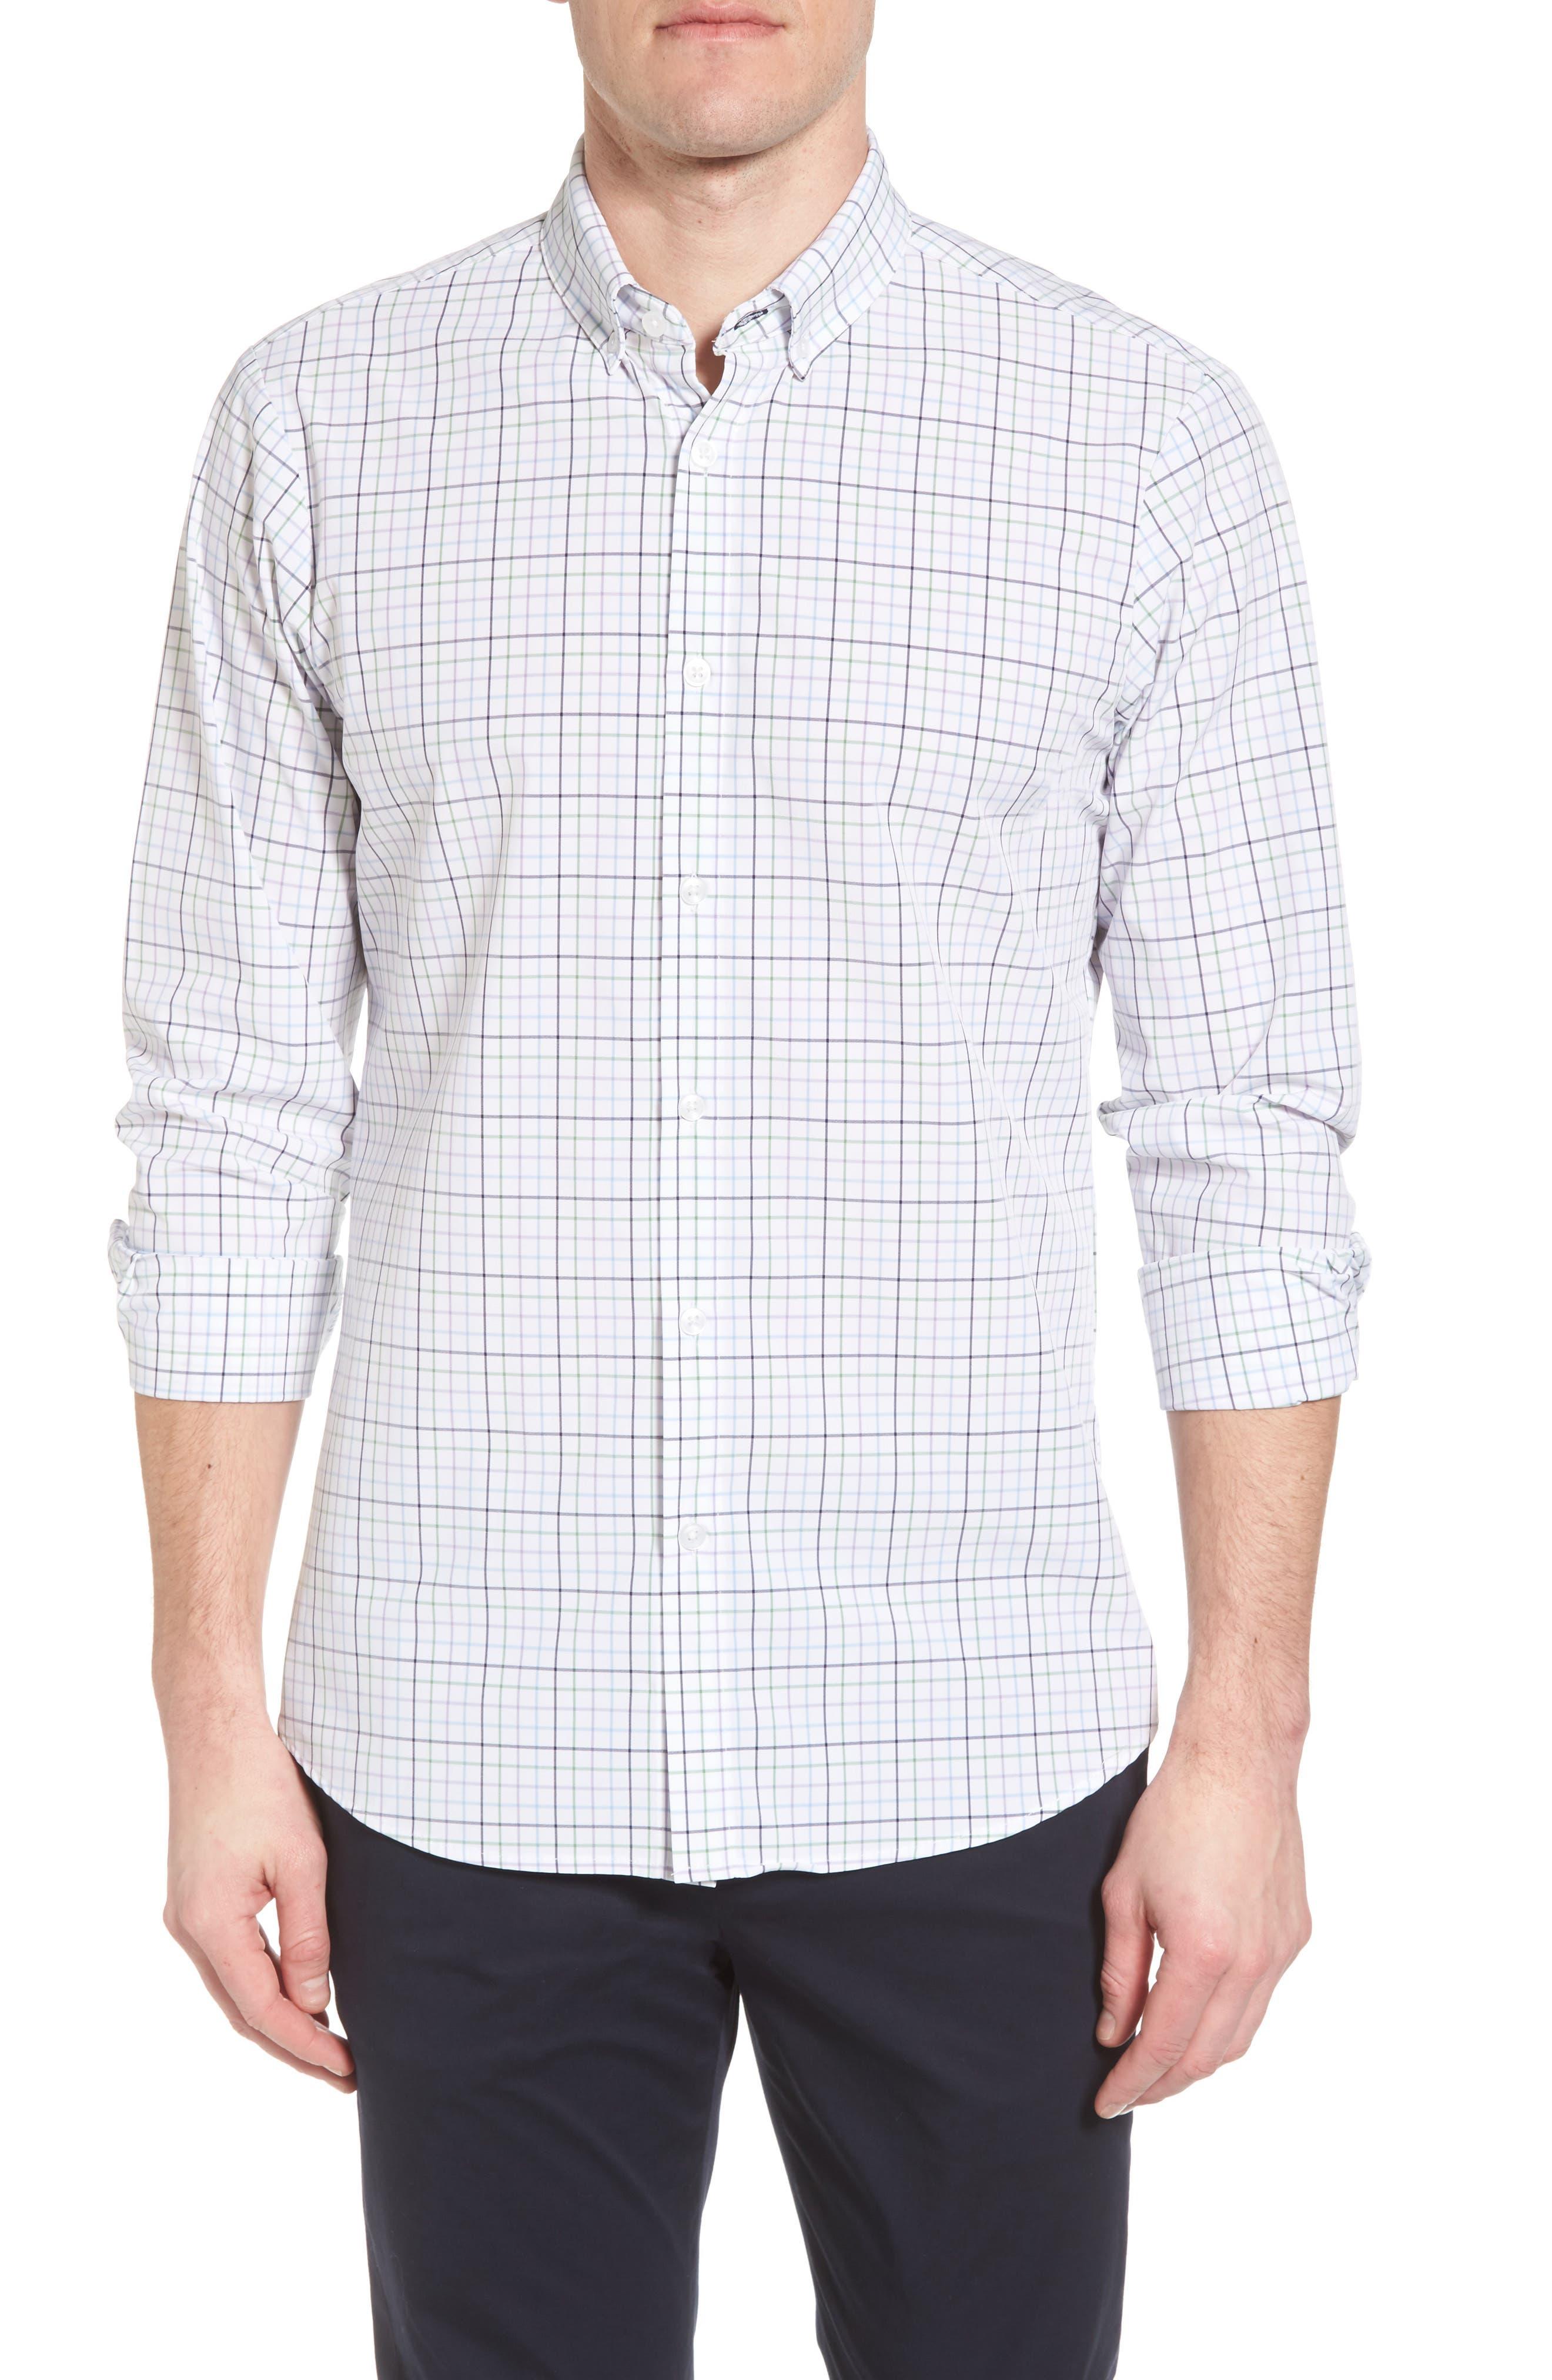 Robertson Check Performance Sport Shirt,                         Main,                         color, Multi